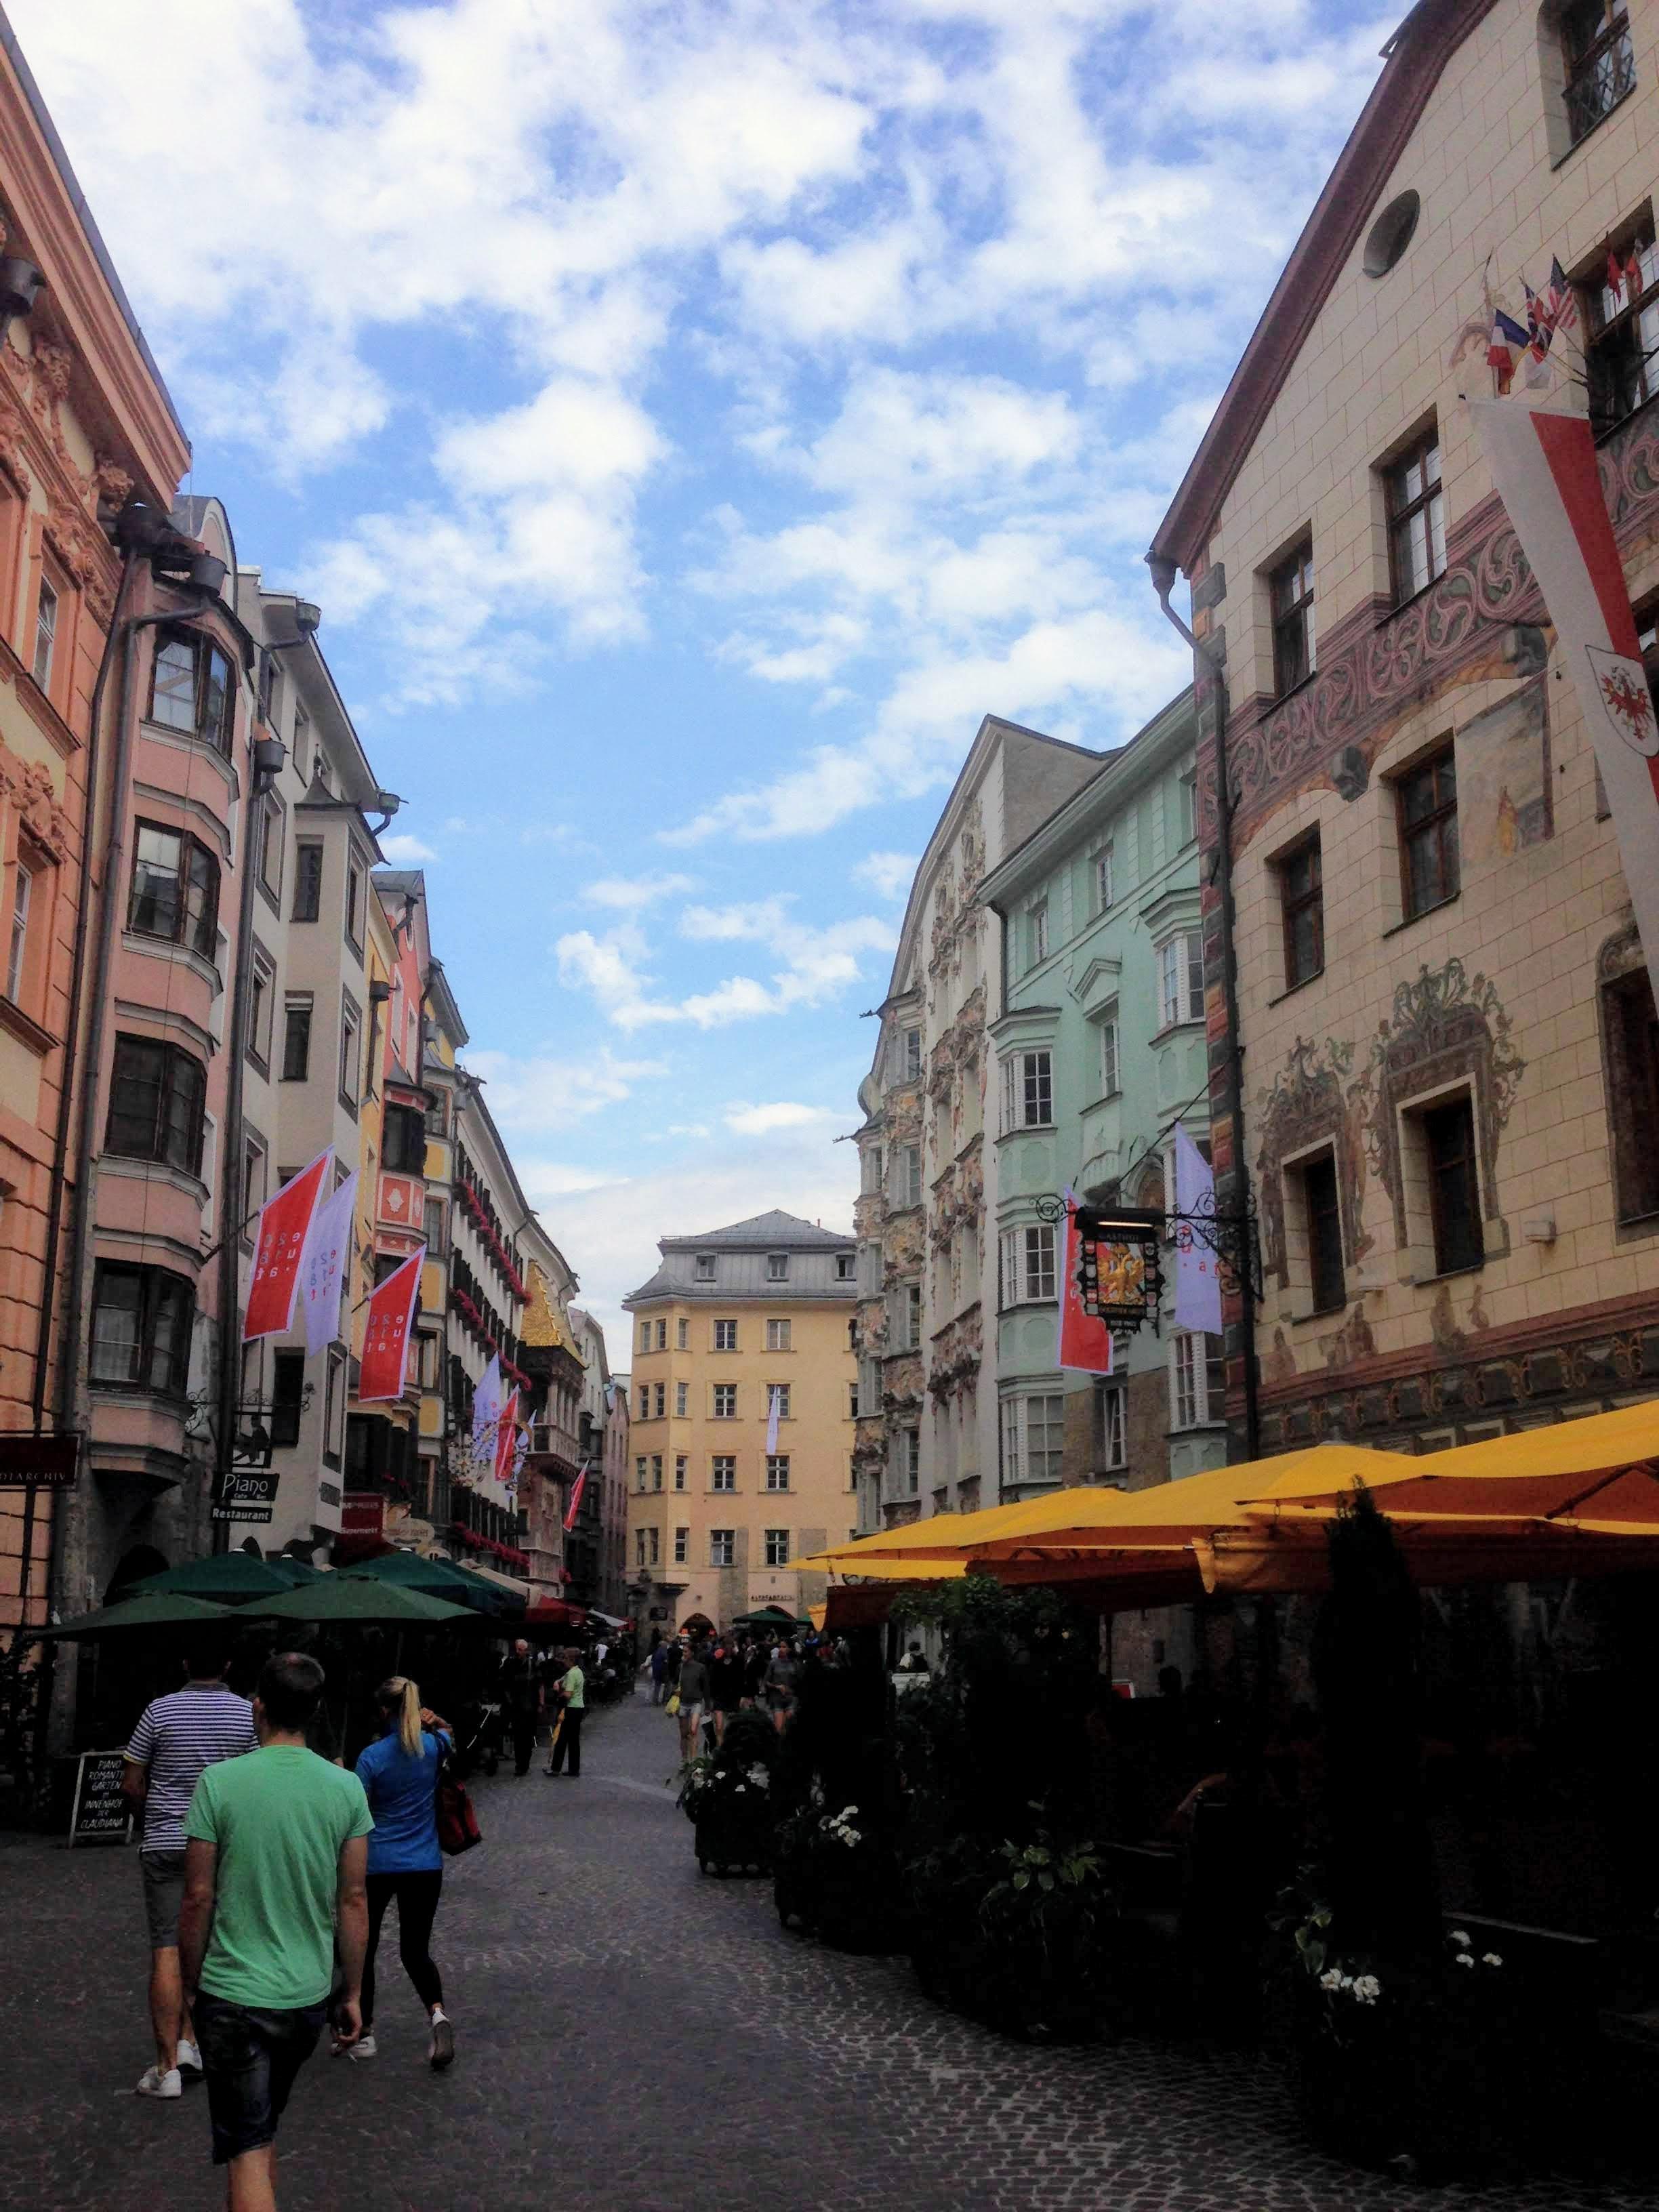 Innsbruck Austria hirstoric city center